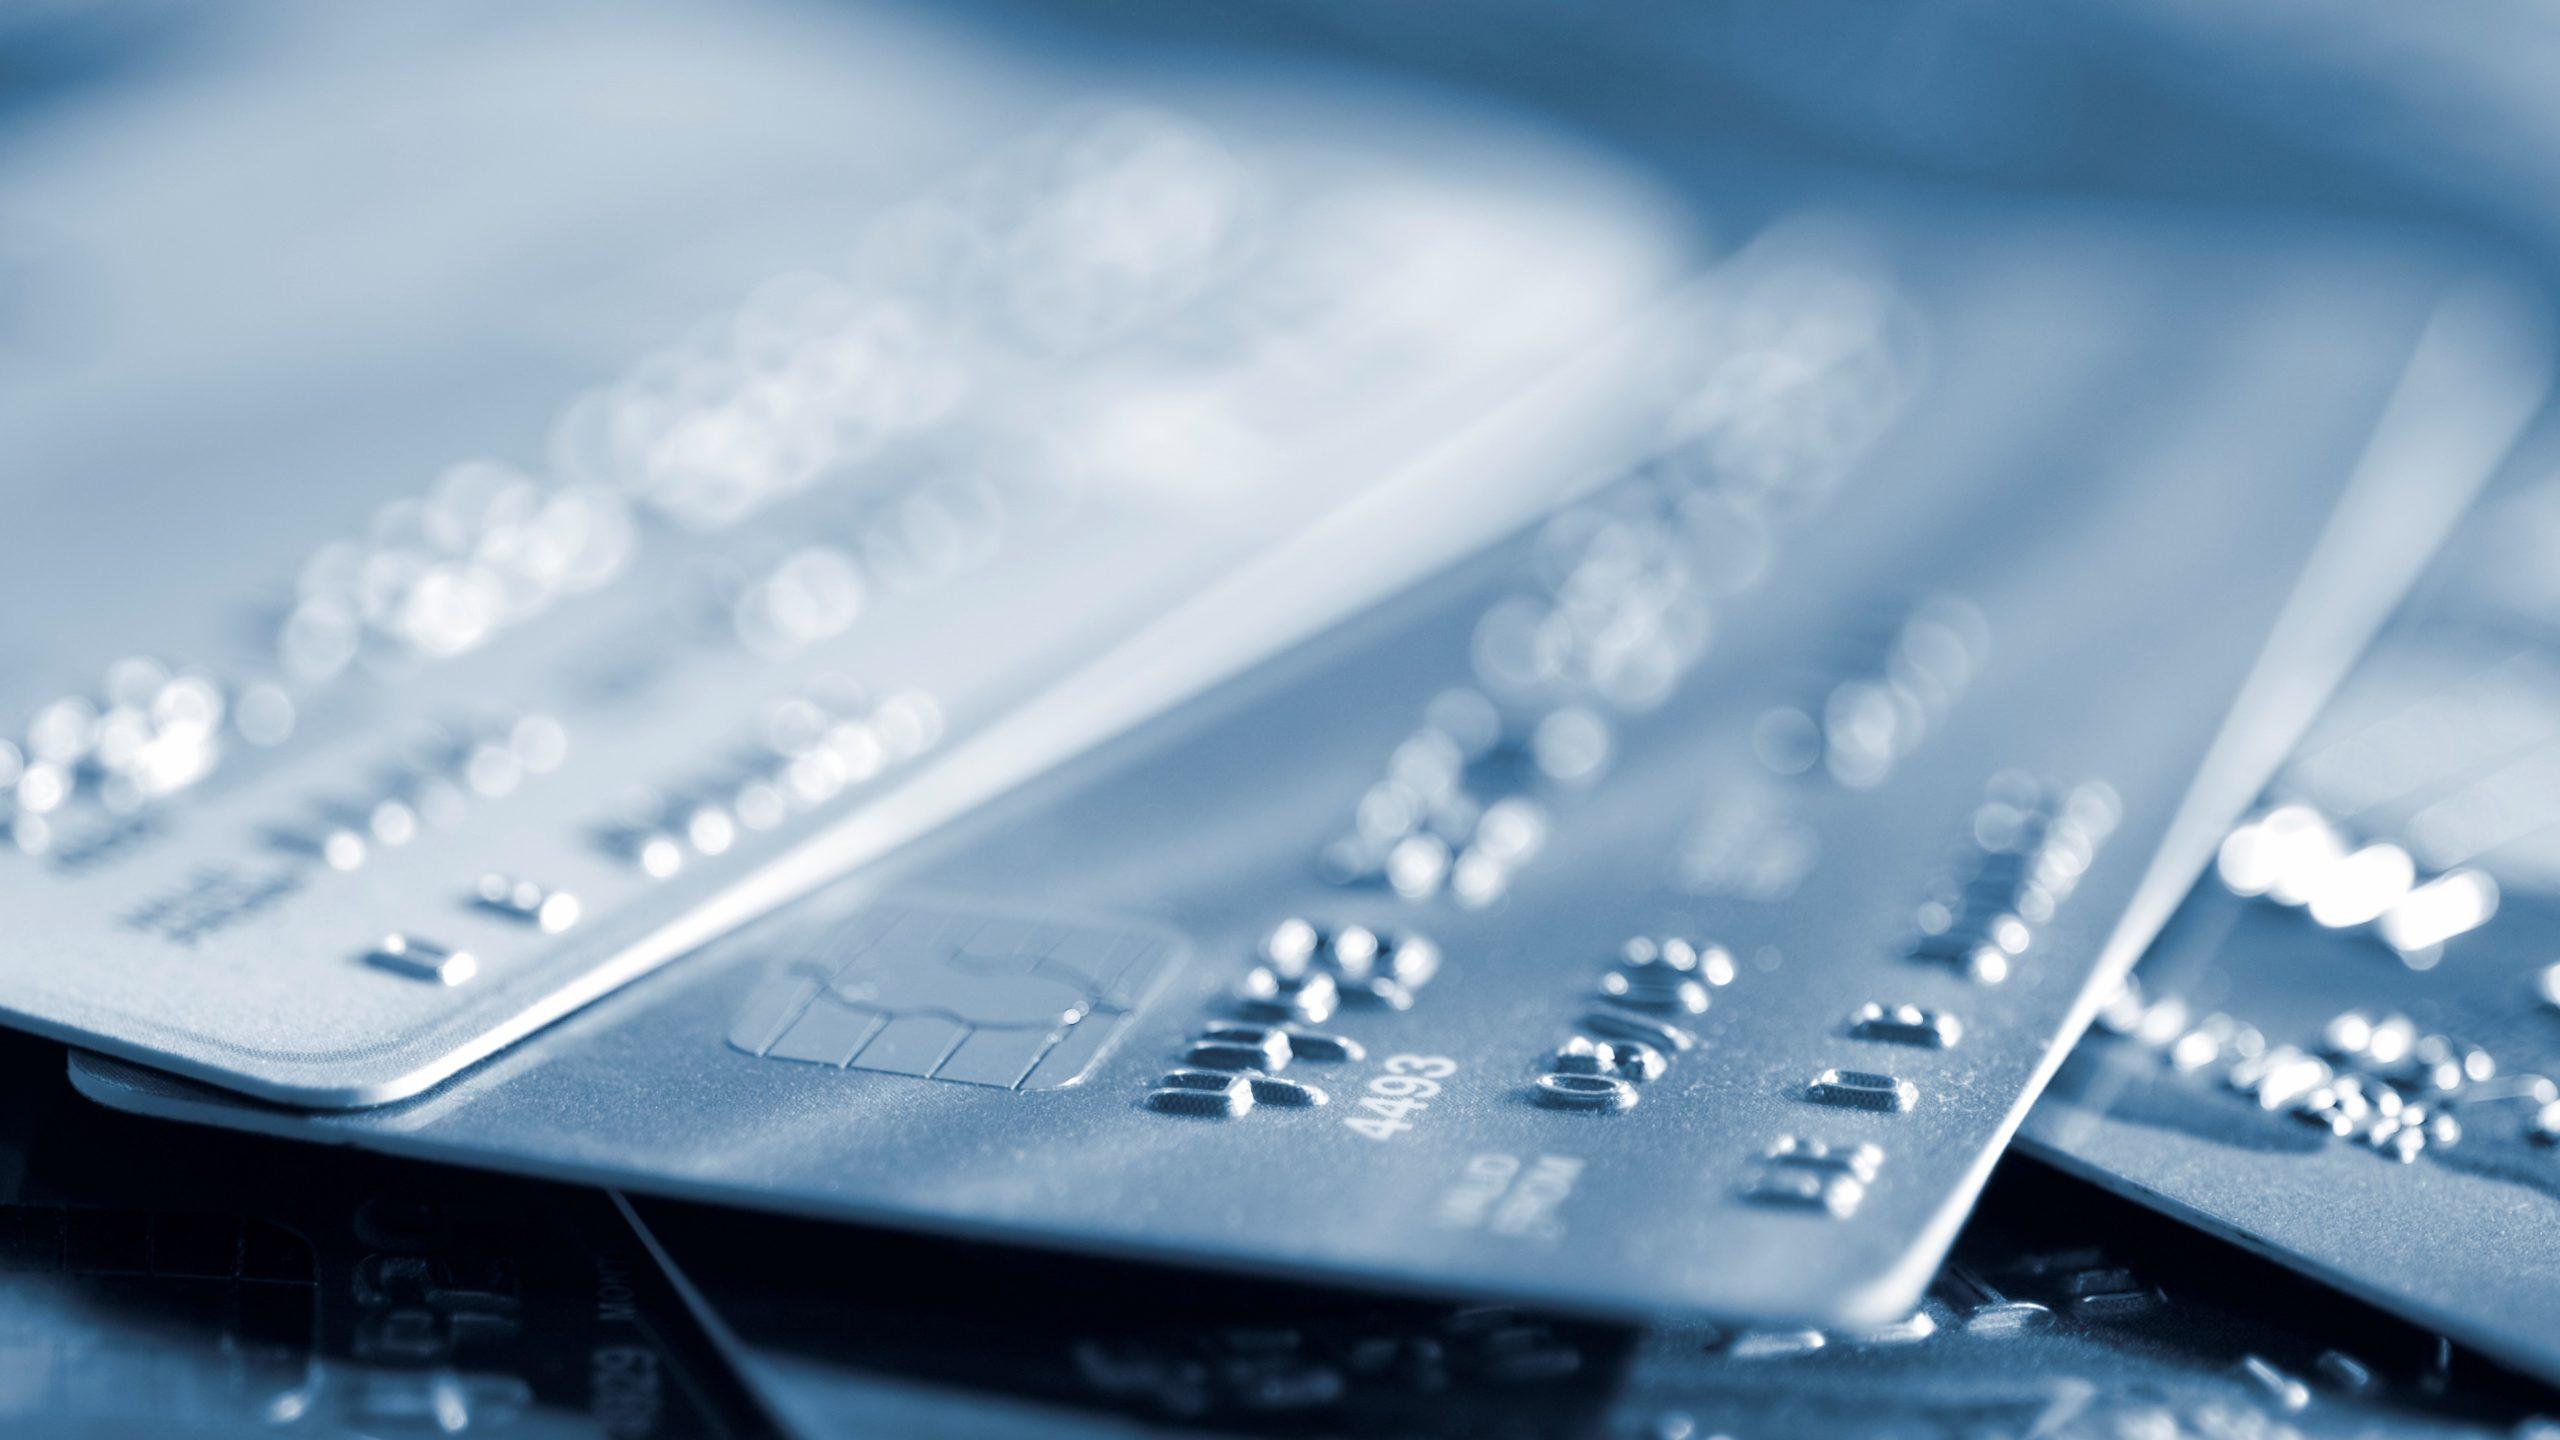 Konvergenz Debitkarten Kreditkarten